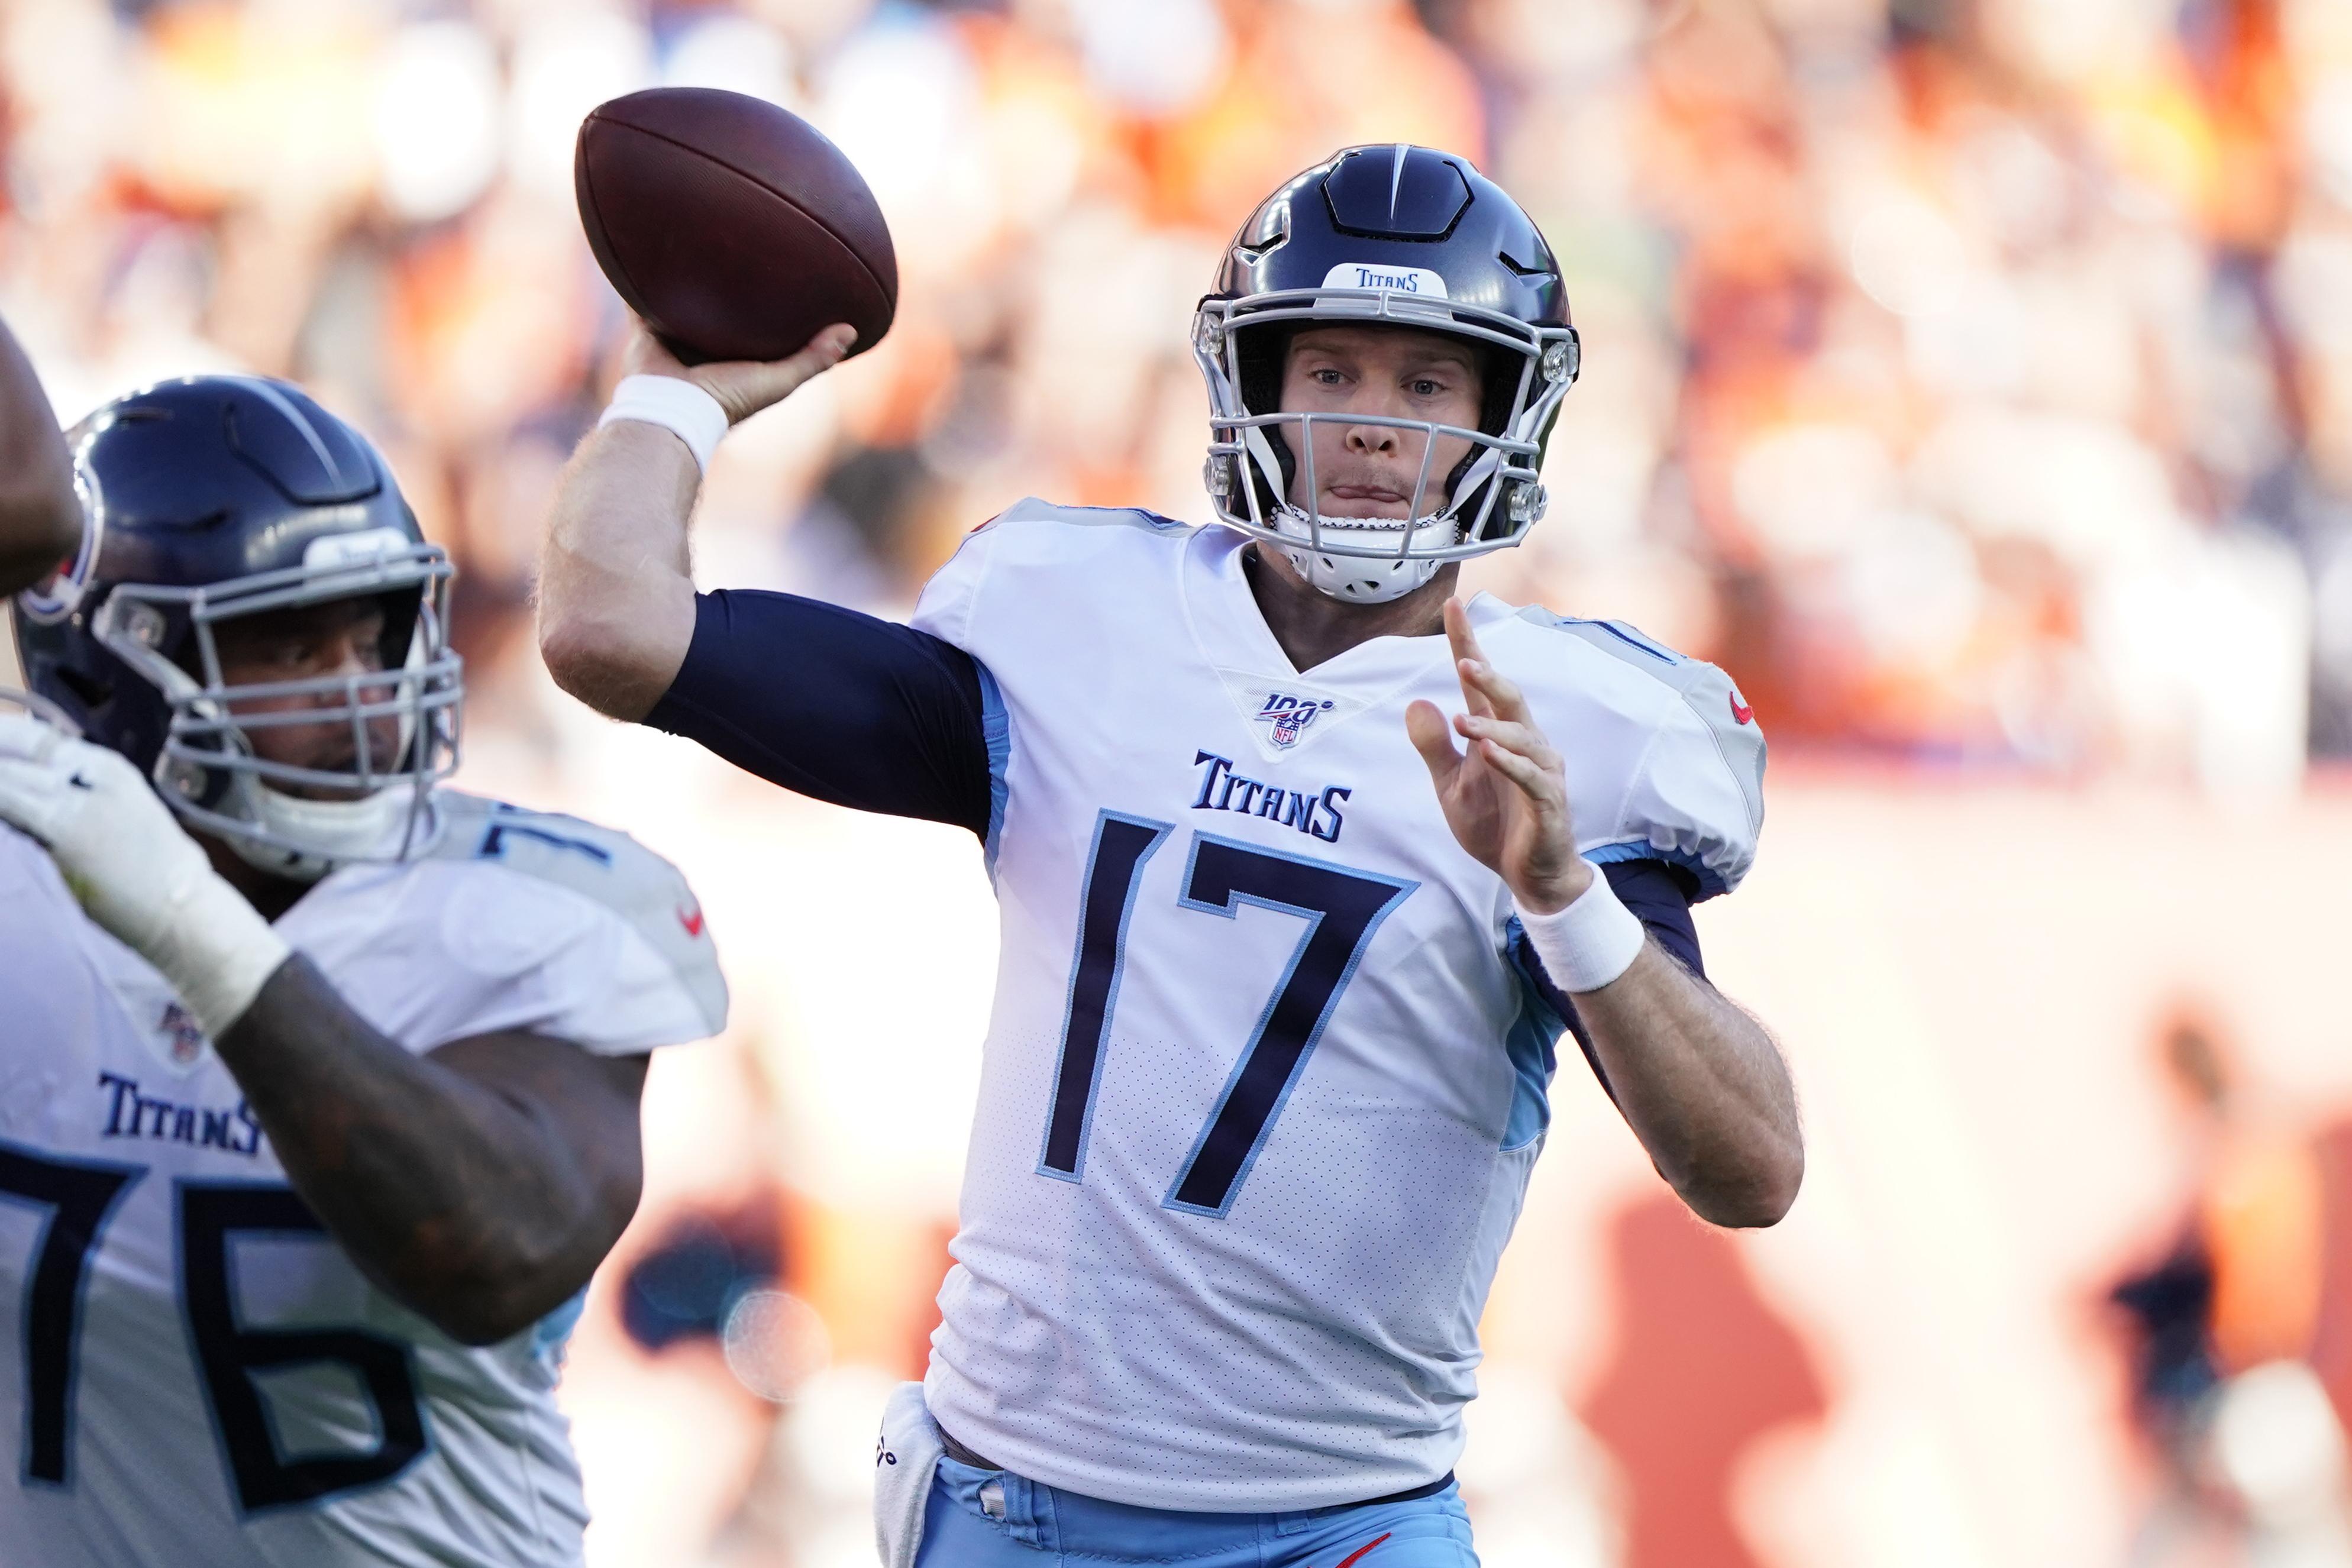 AP source: Titans to start Ryan Tannehill instead of Mariota